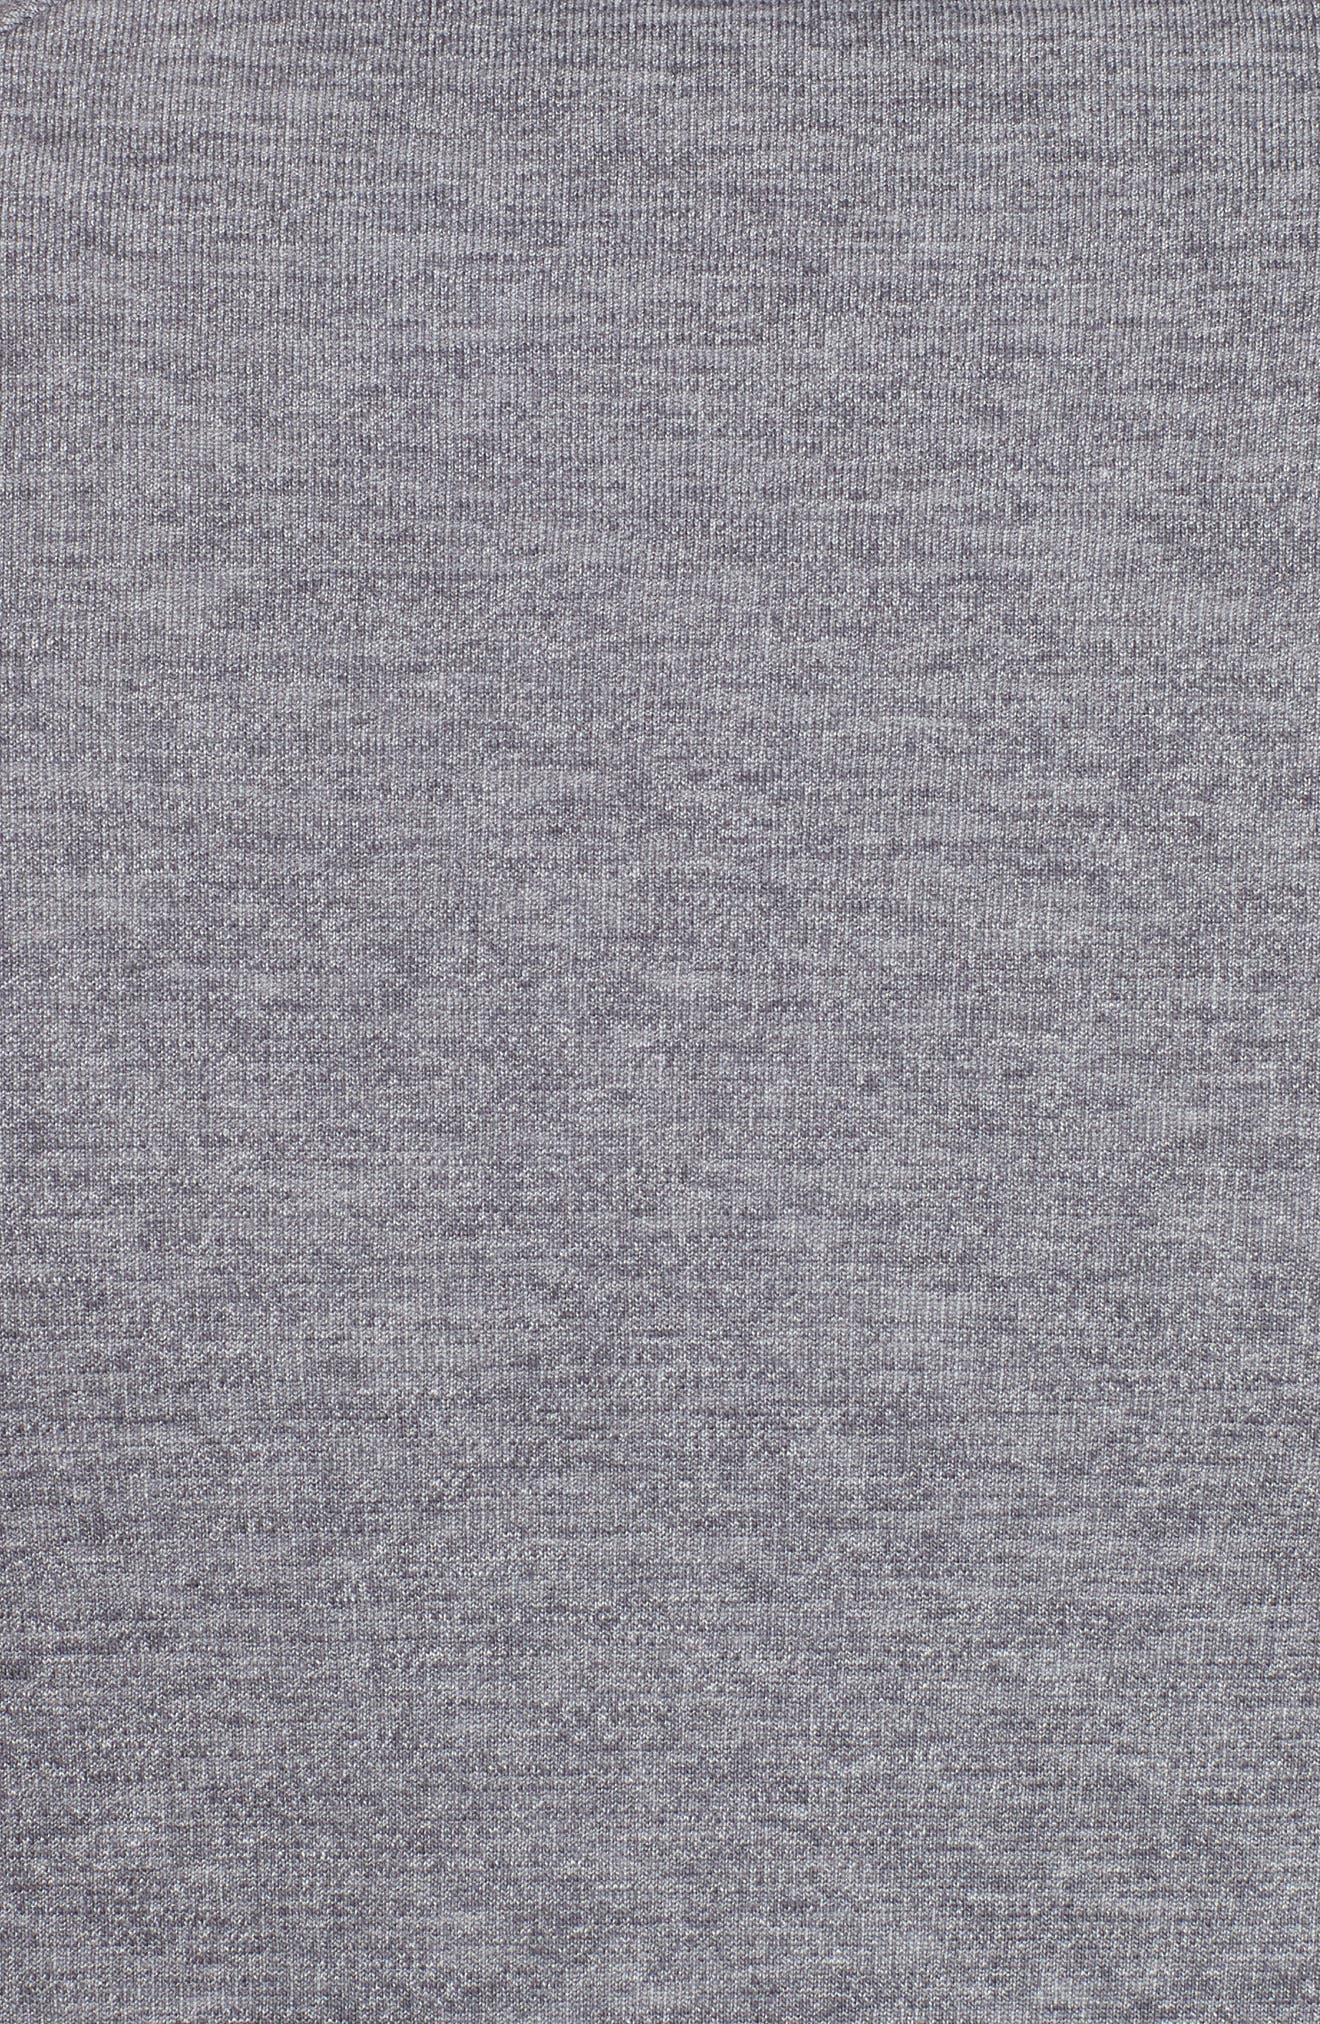 UNDER ARMOUR,                             Sportstyle 2x Crew Sweatshirt,                             Alternate thumbnail 5, color,                             STEEL